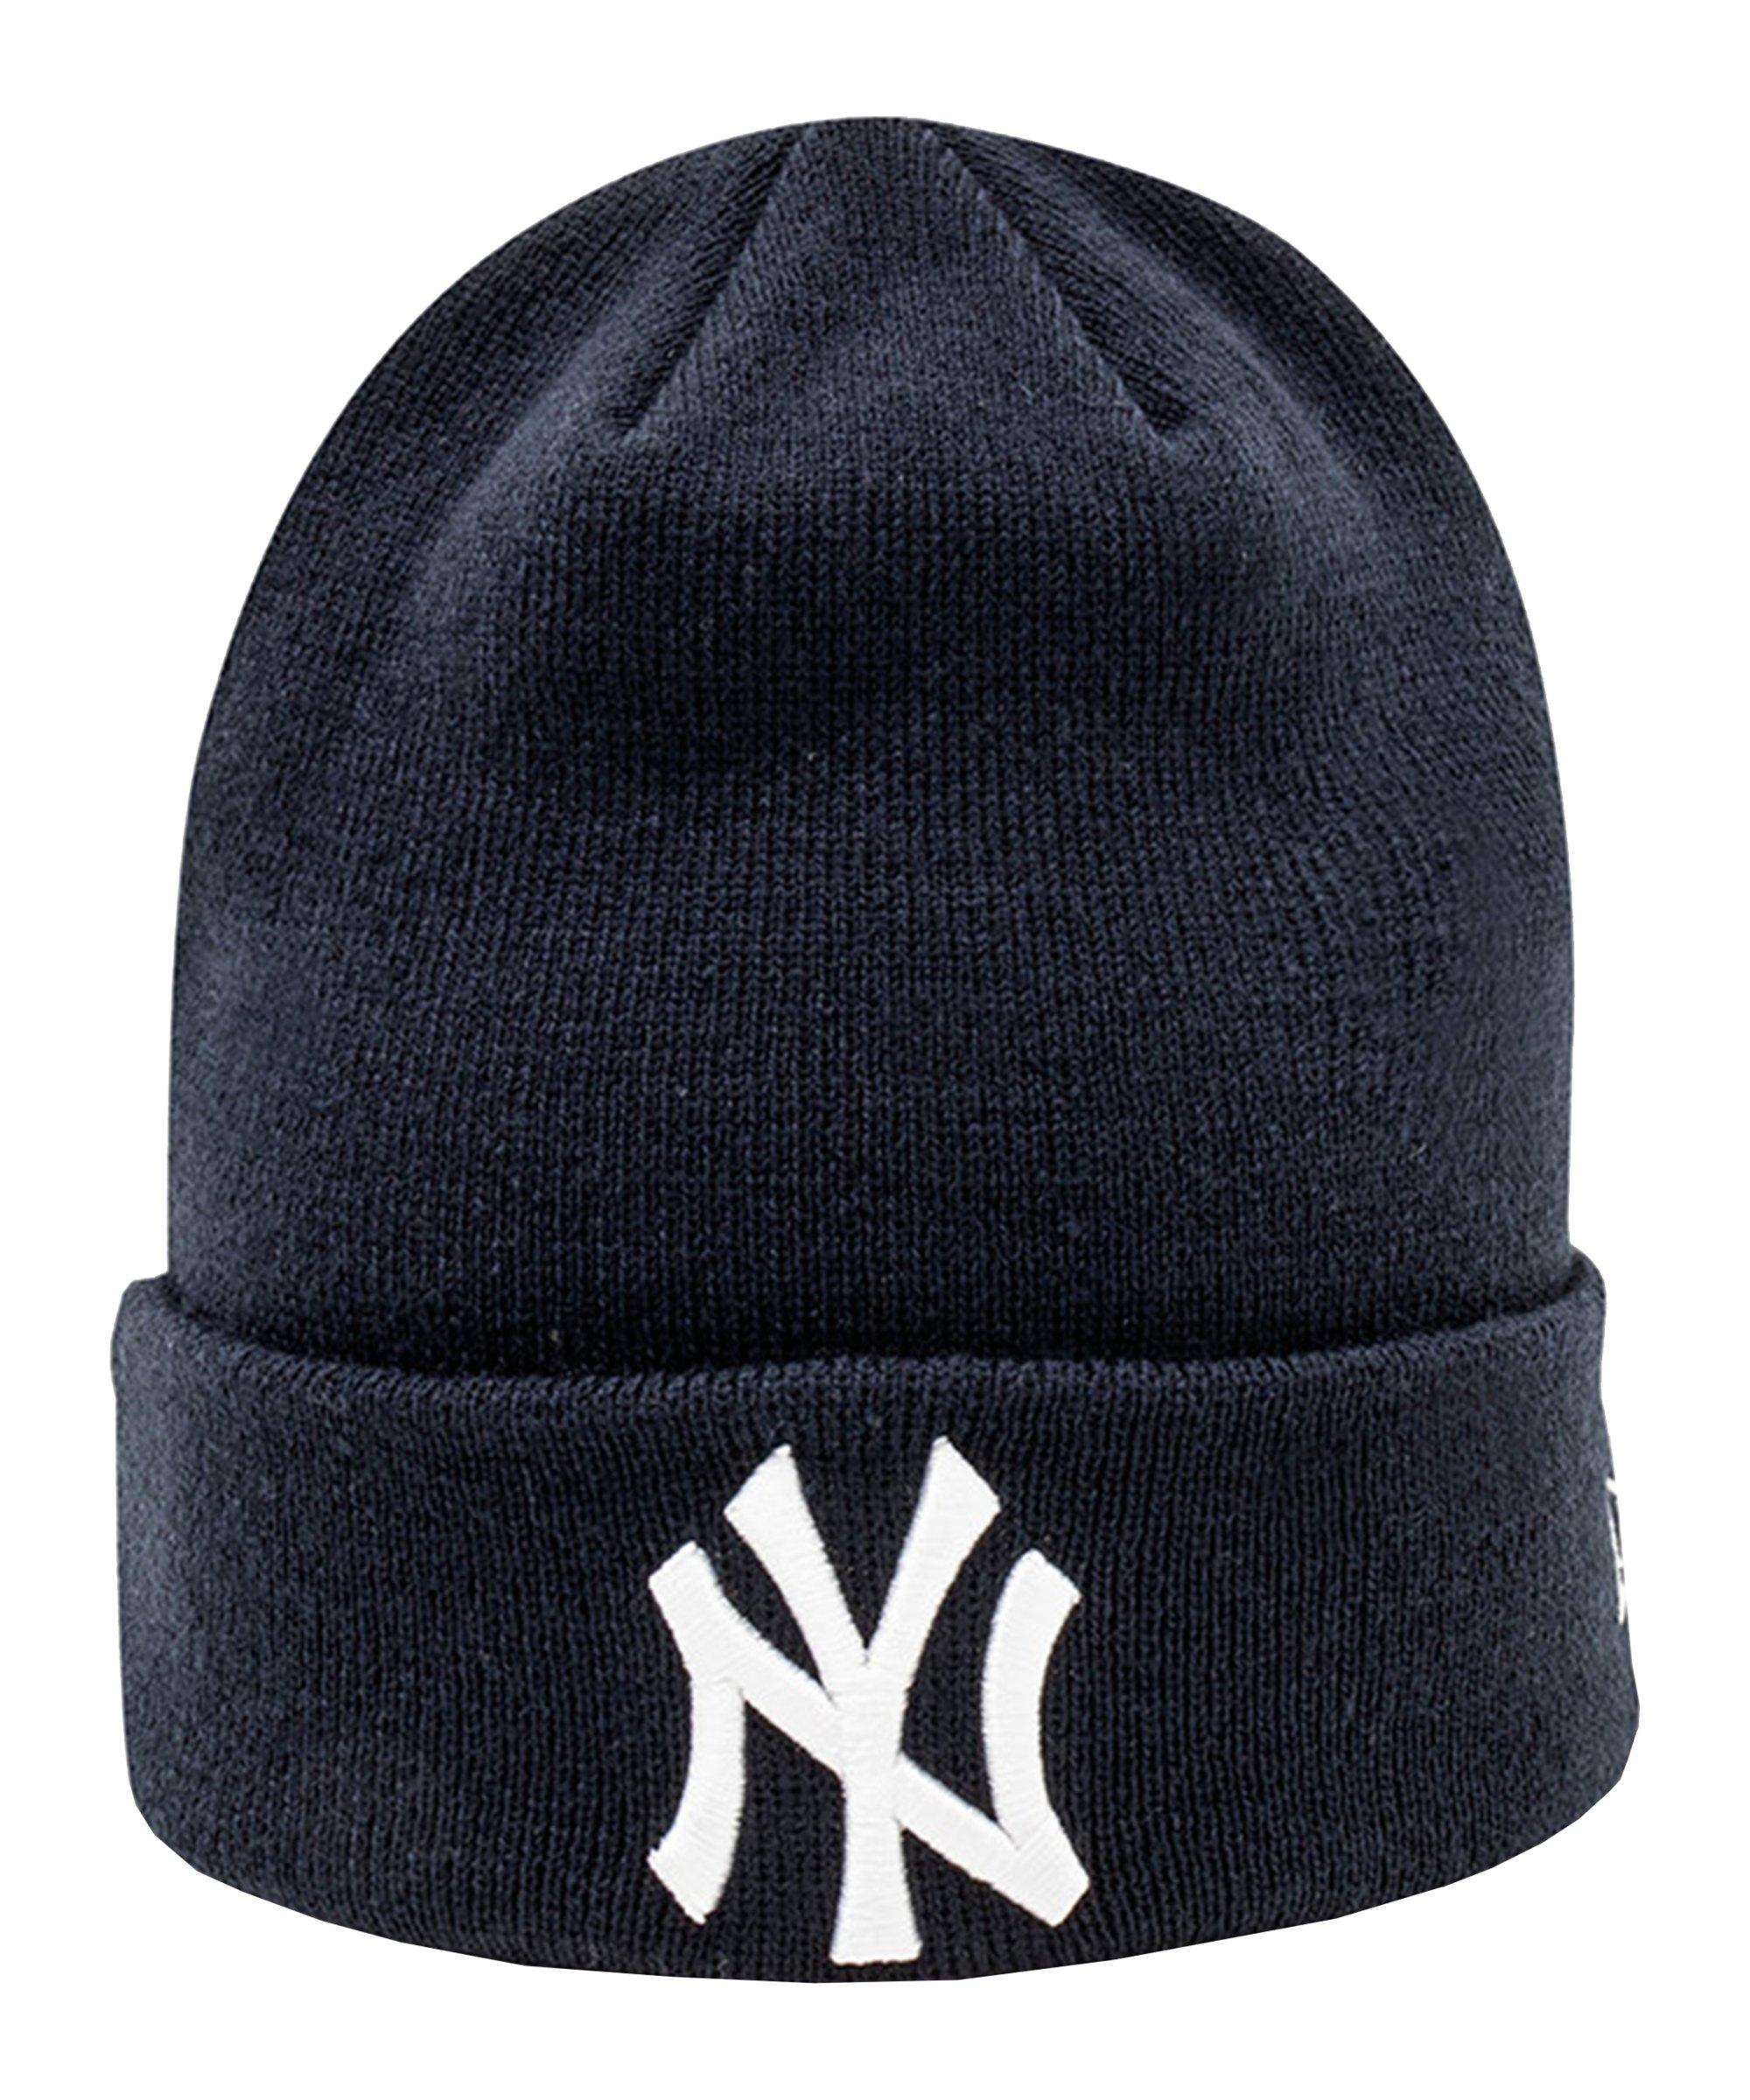 New Era NY Yankees Cuff Knit Beanie Blau FOTC - blau